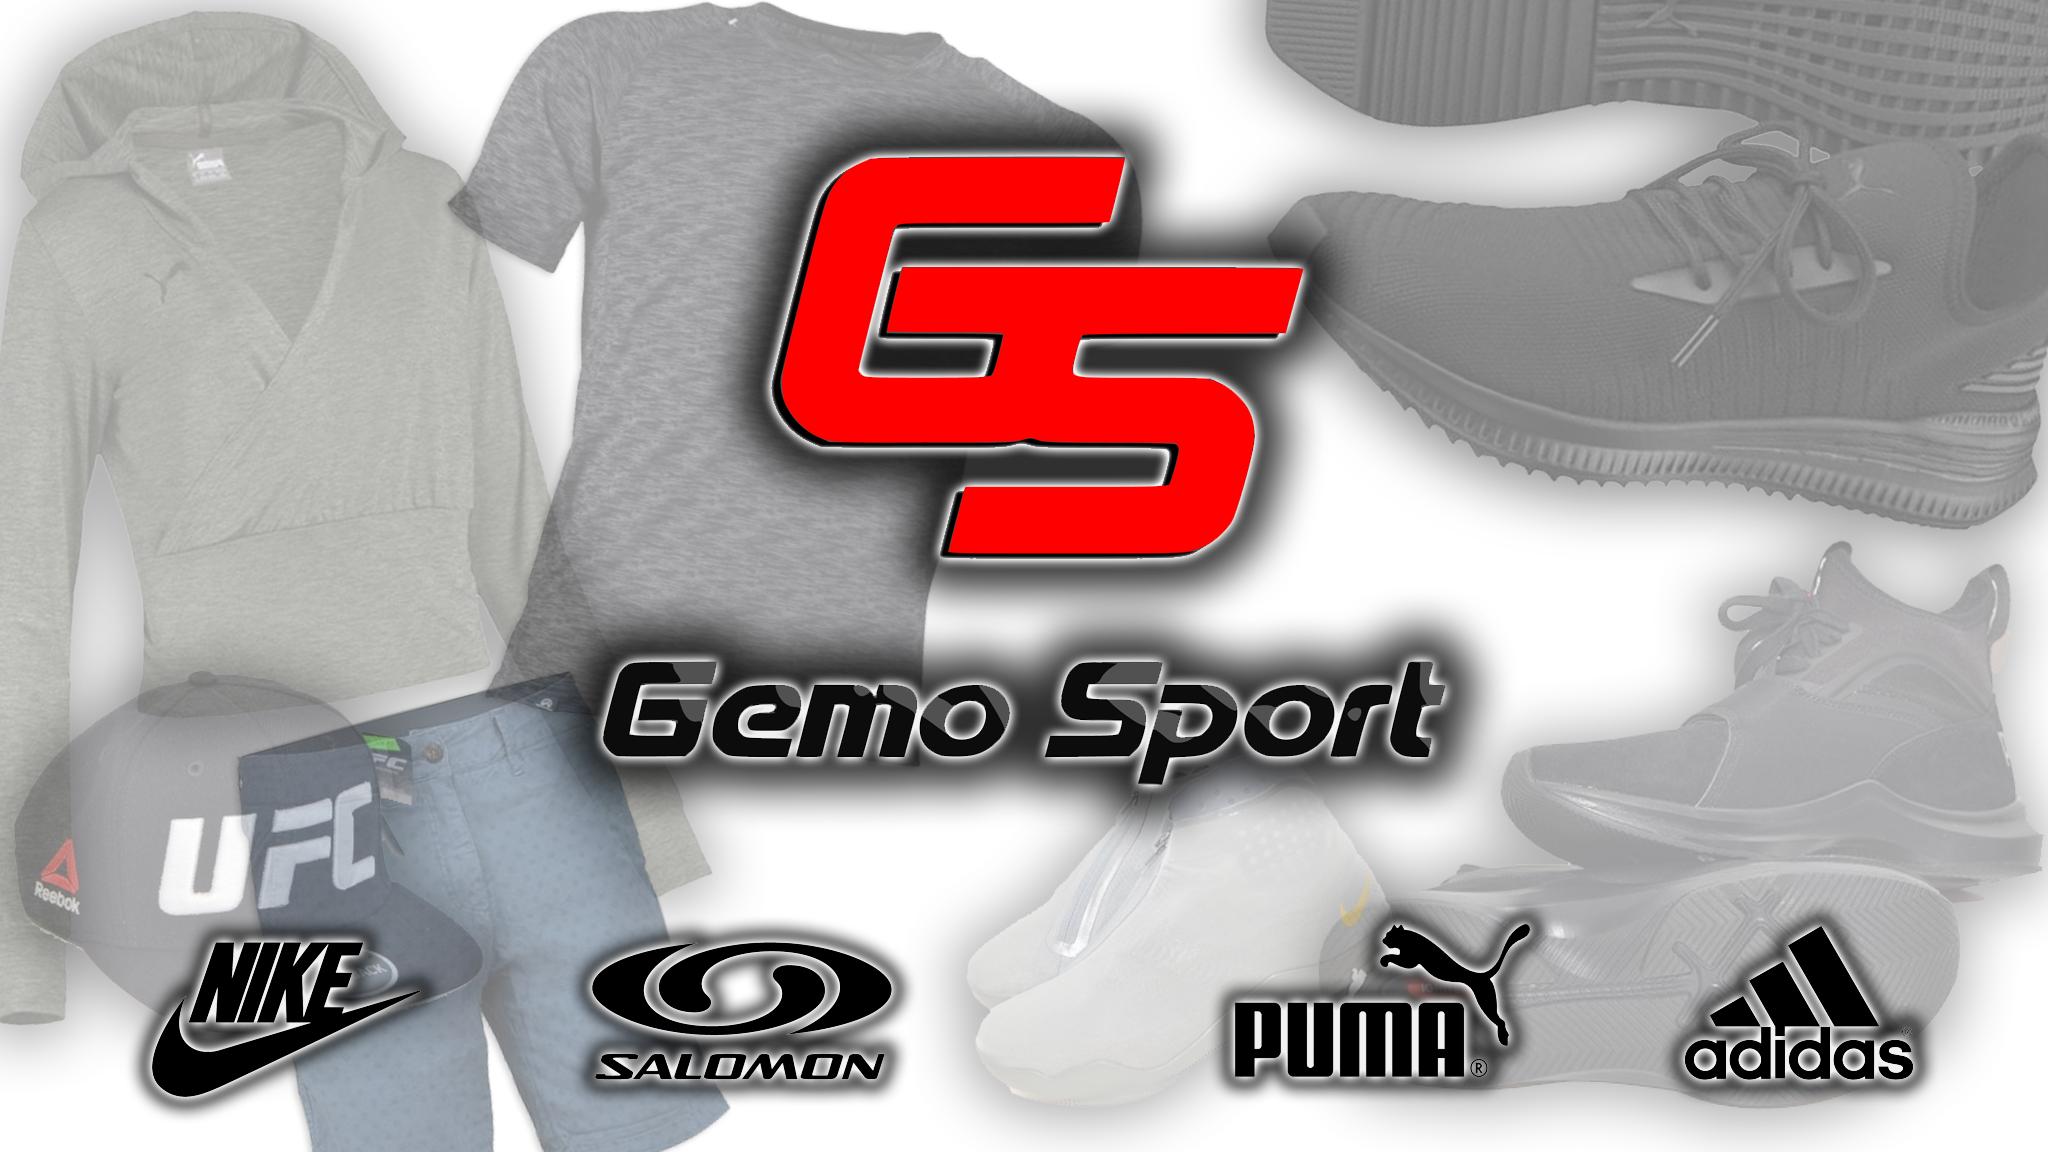 b02d8baf81 Gemo Sport